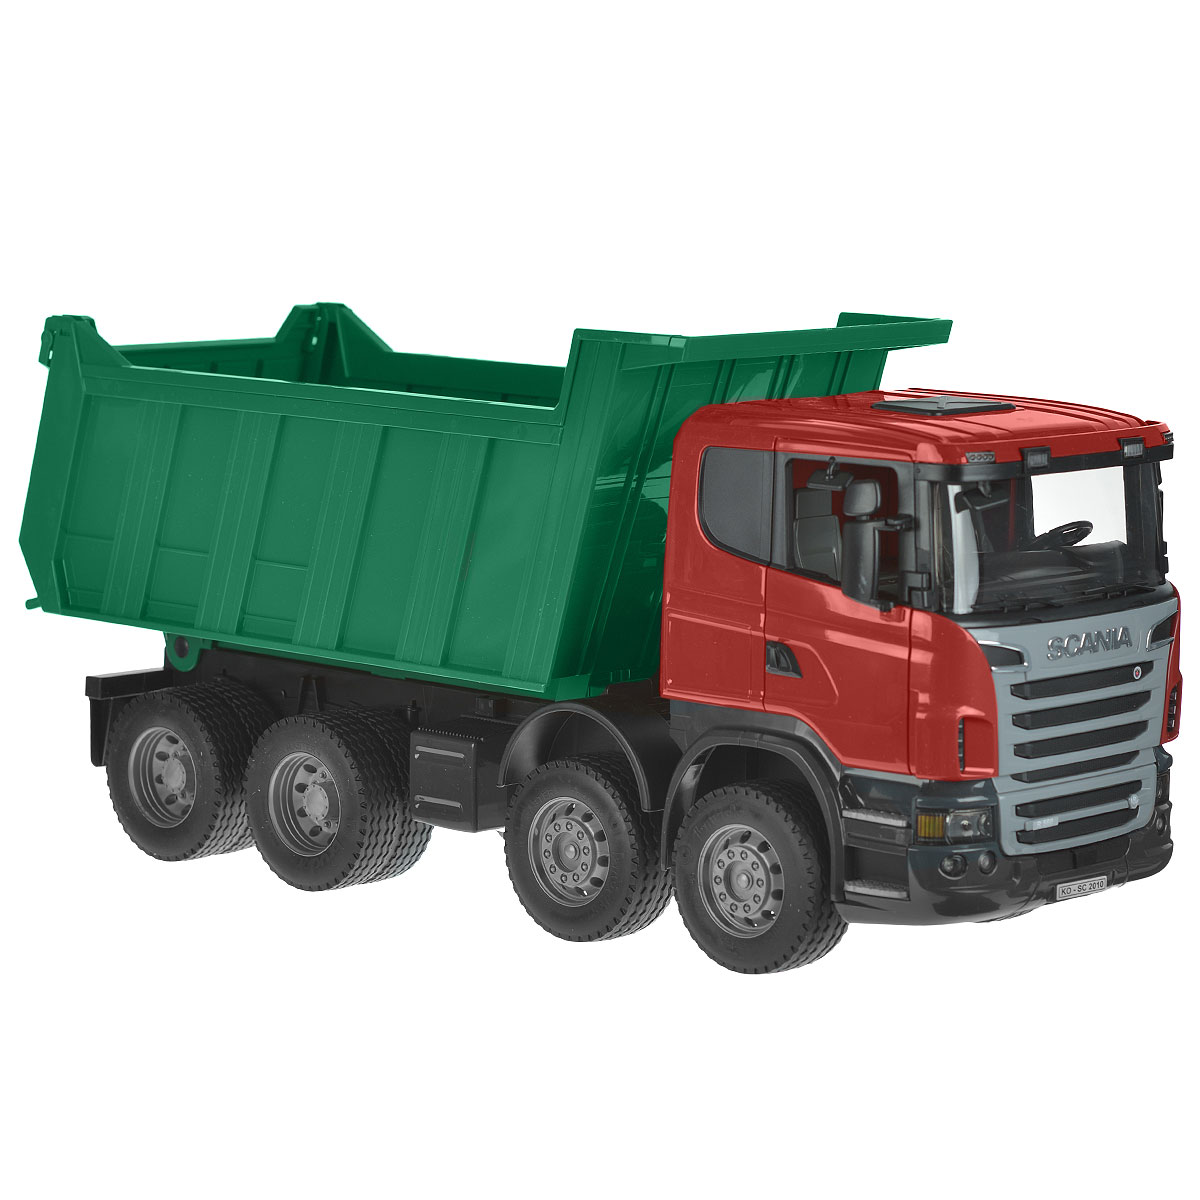 Bruder Самосвал Scania цвет зеленый красный цена